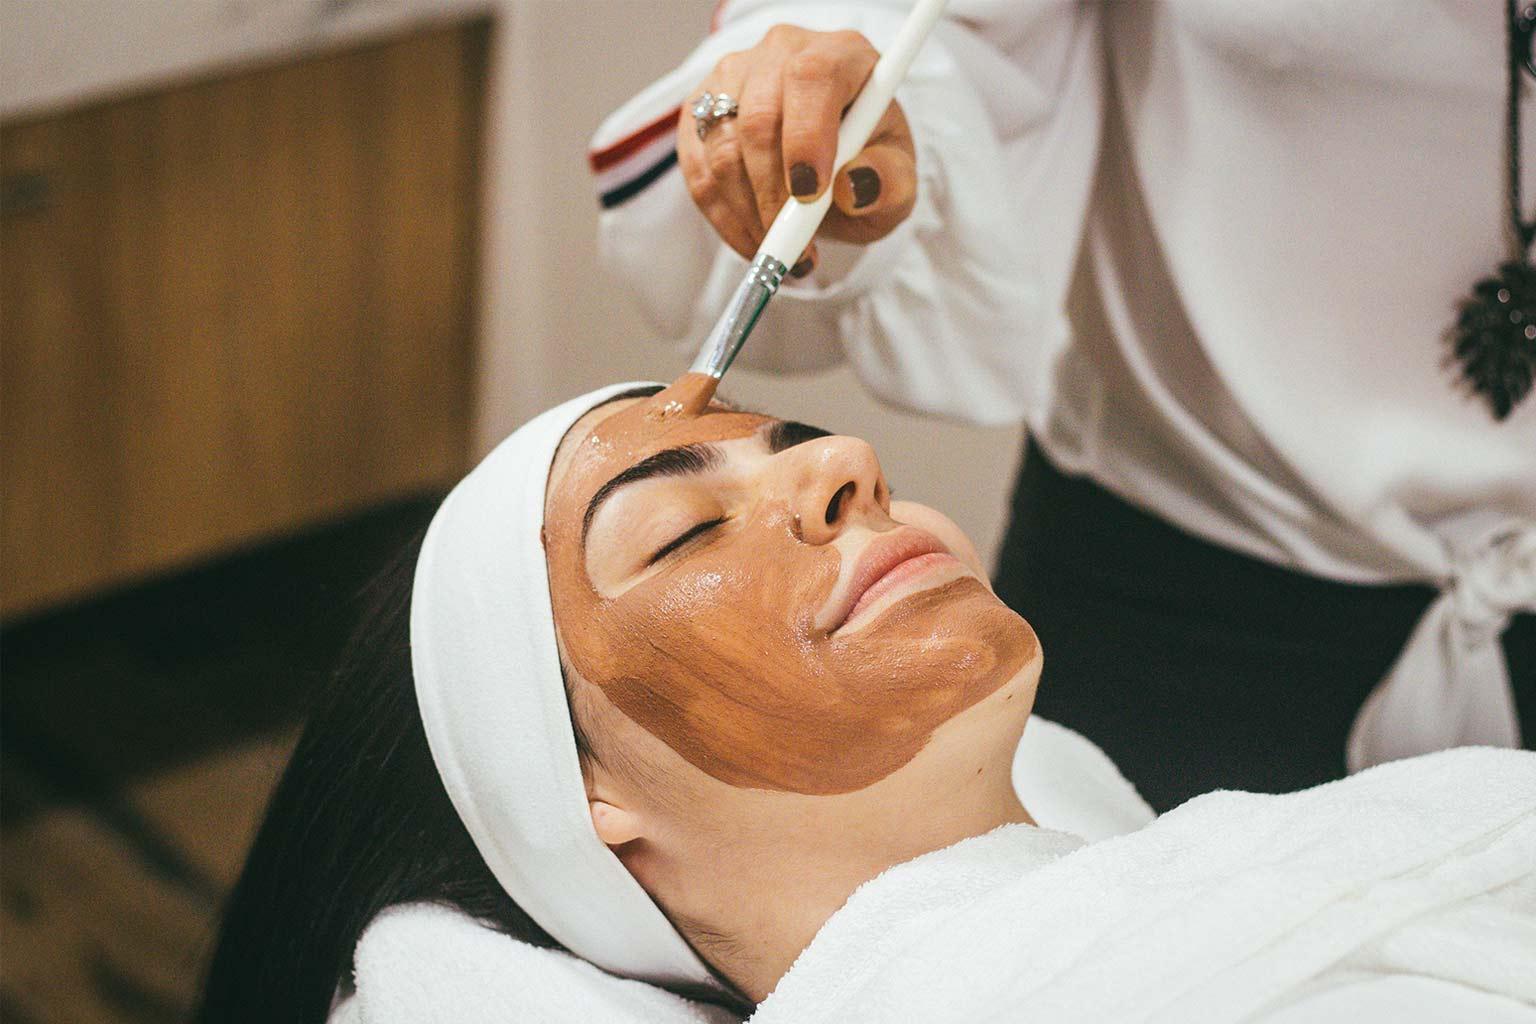 Facial treatment at TRG